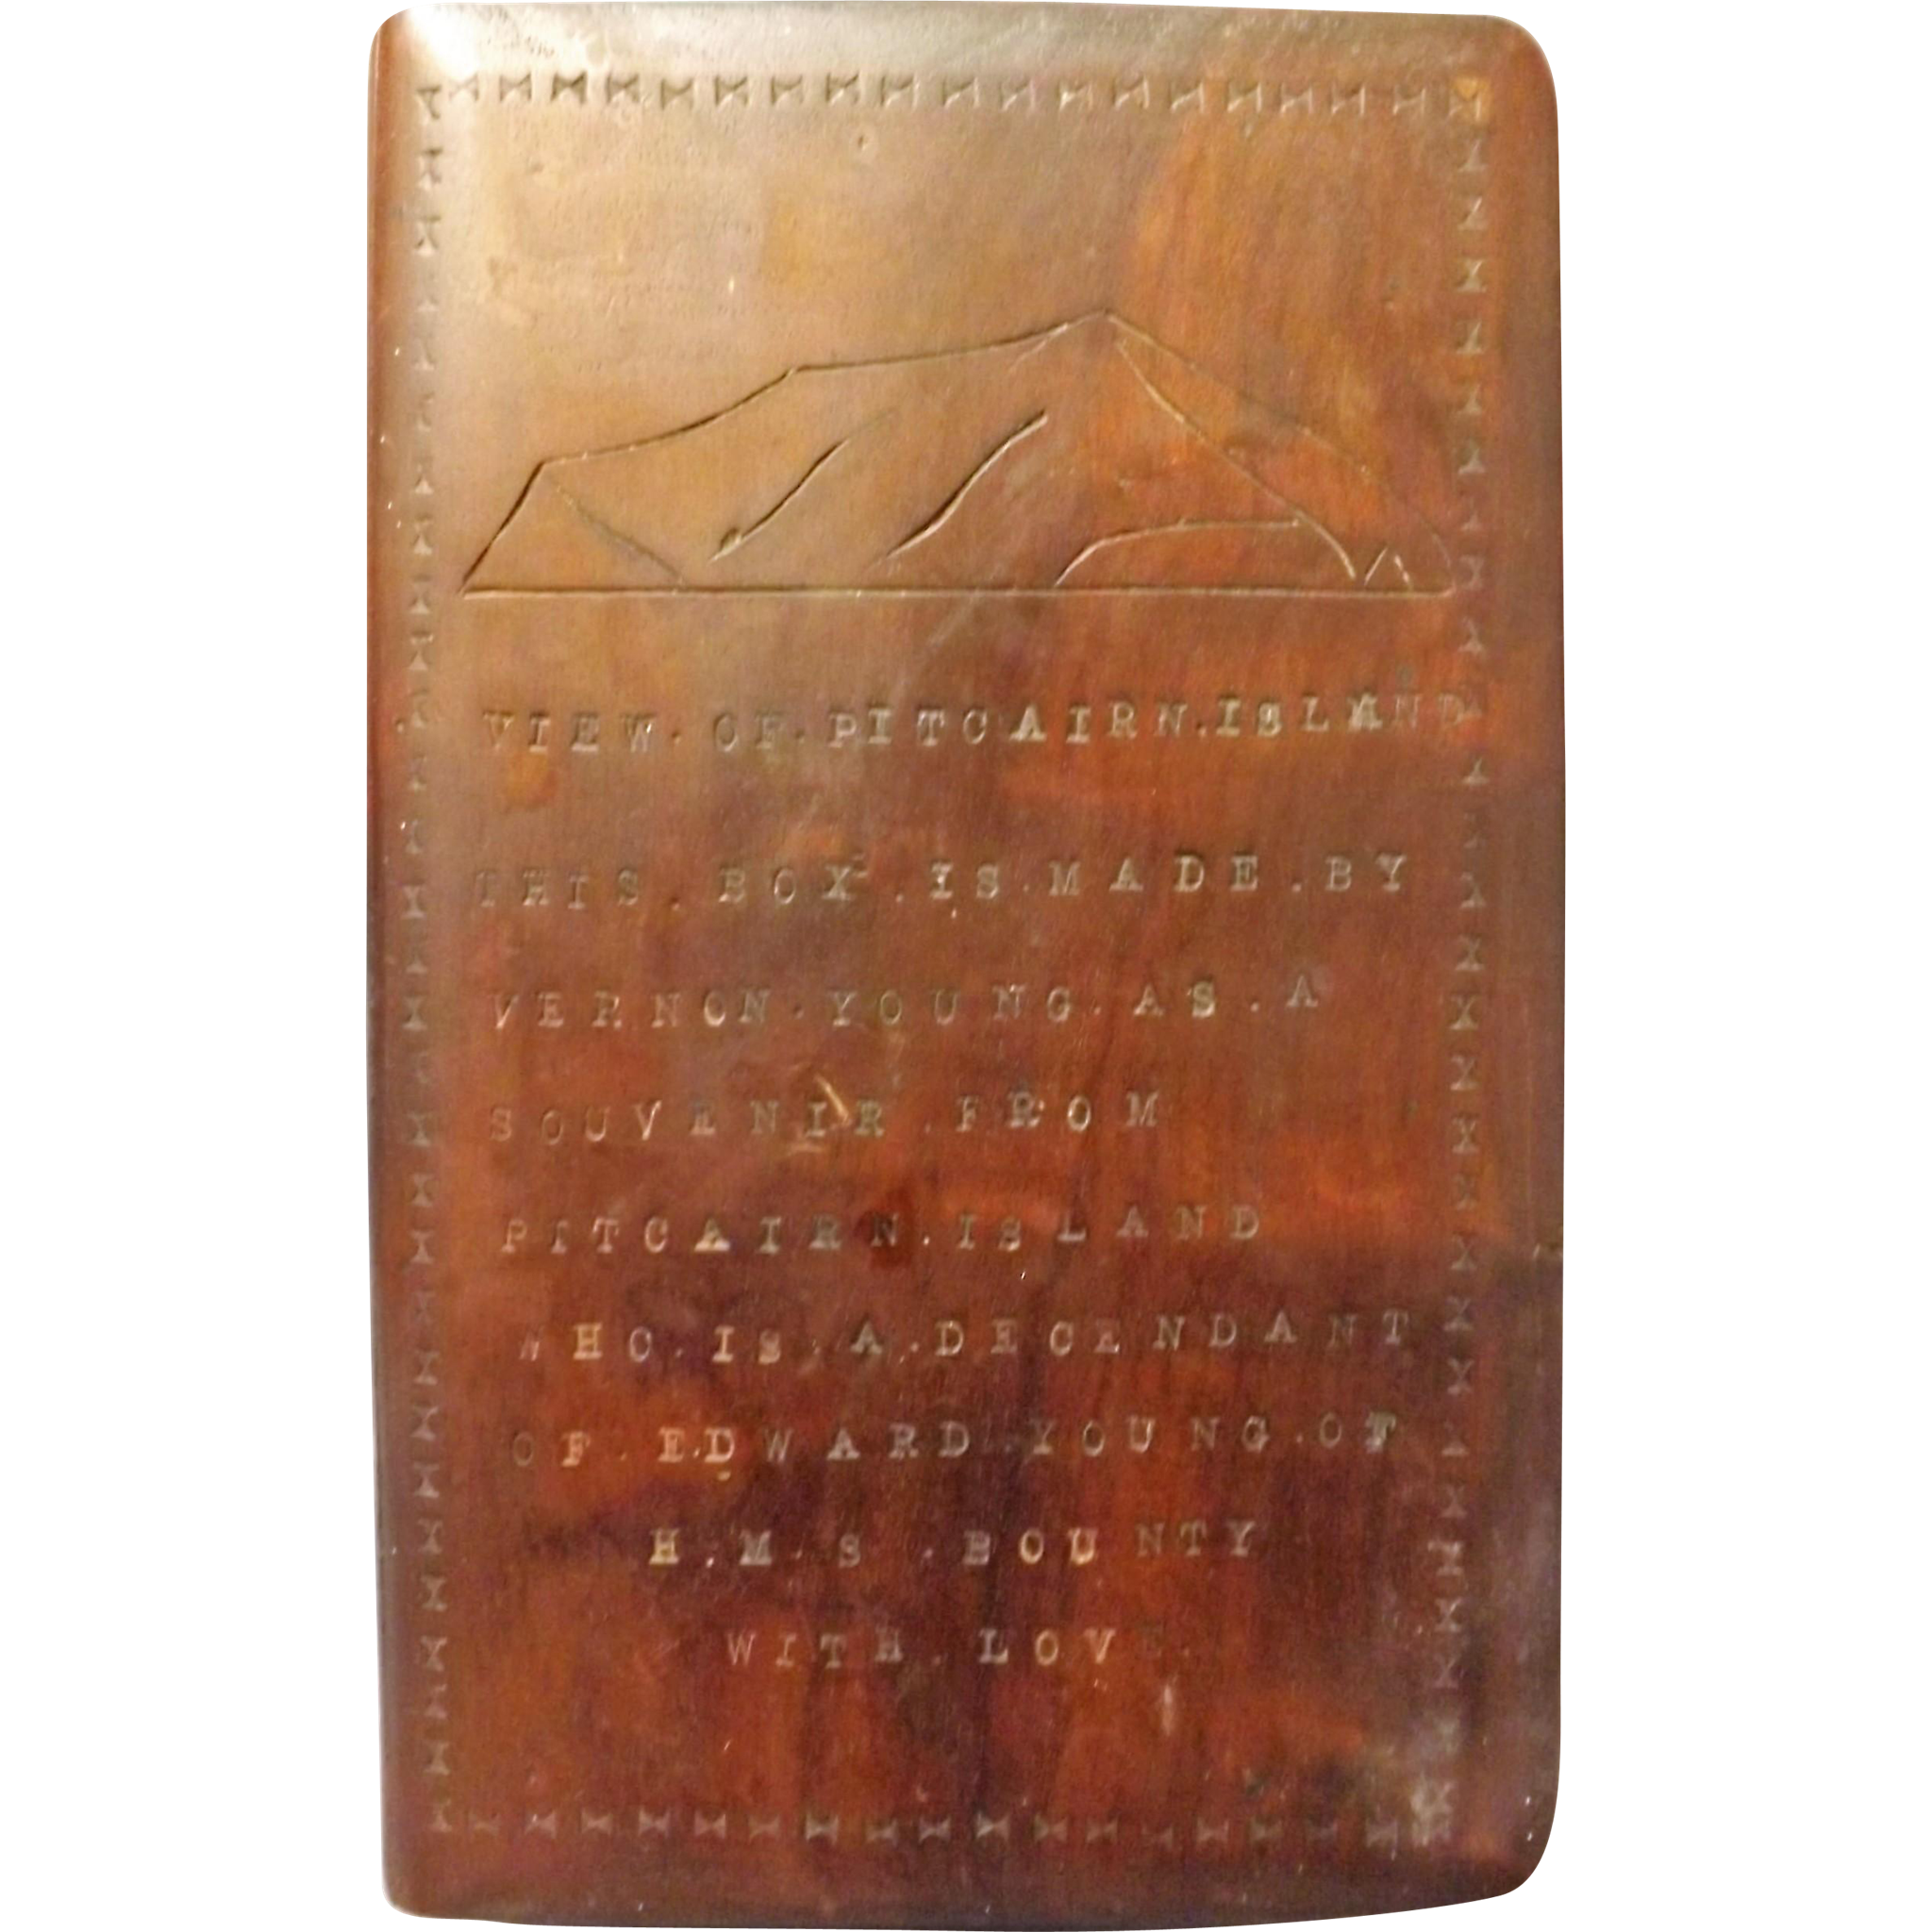 Pitcairn Island Hand Made Wooden Souvenir Box -Circa 1940's